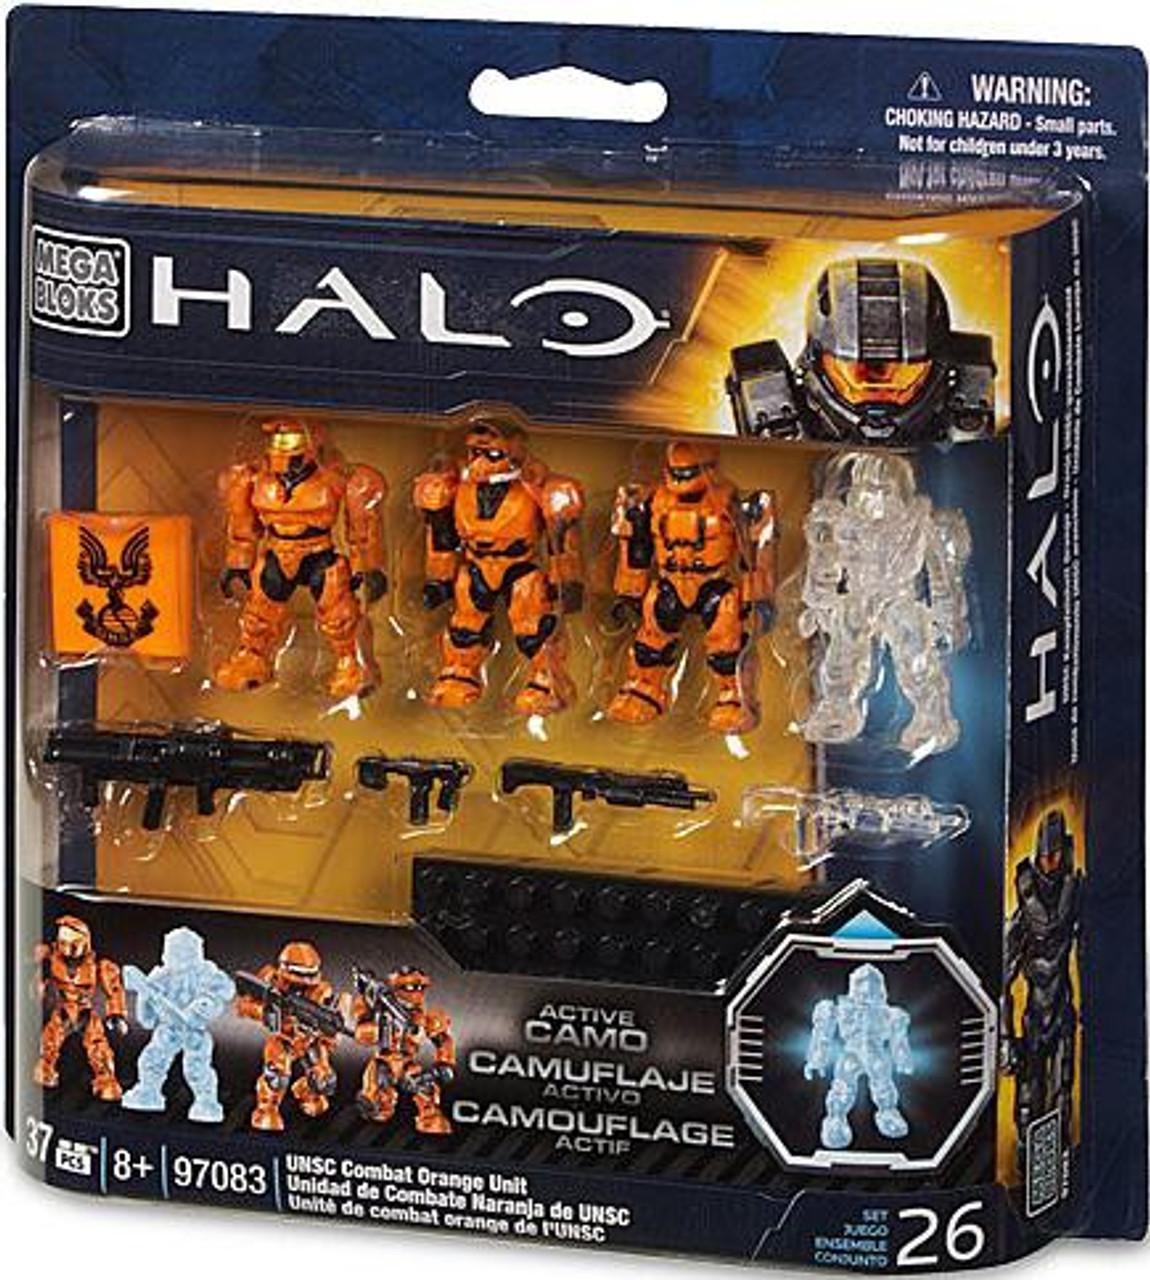 Mega Bloks Halo UNSC Combat Orange Unit Set #97083